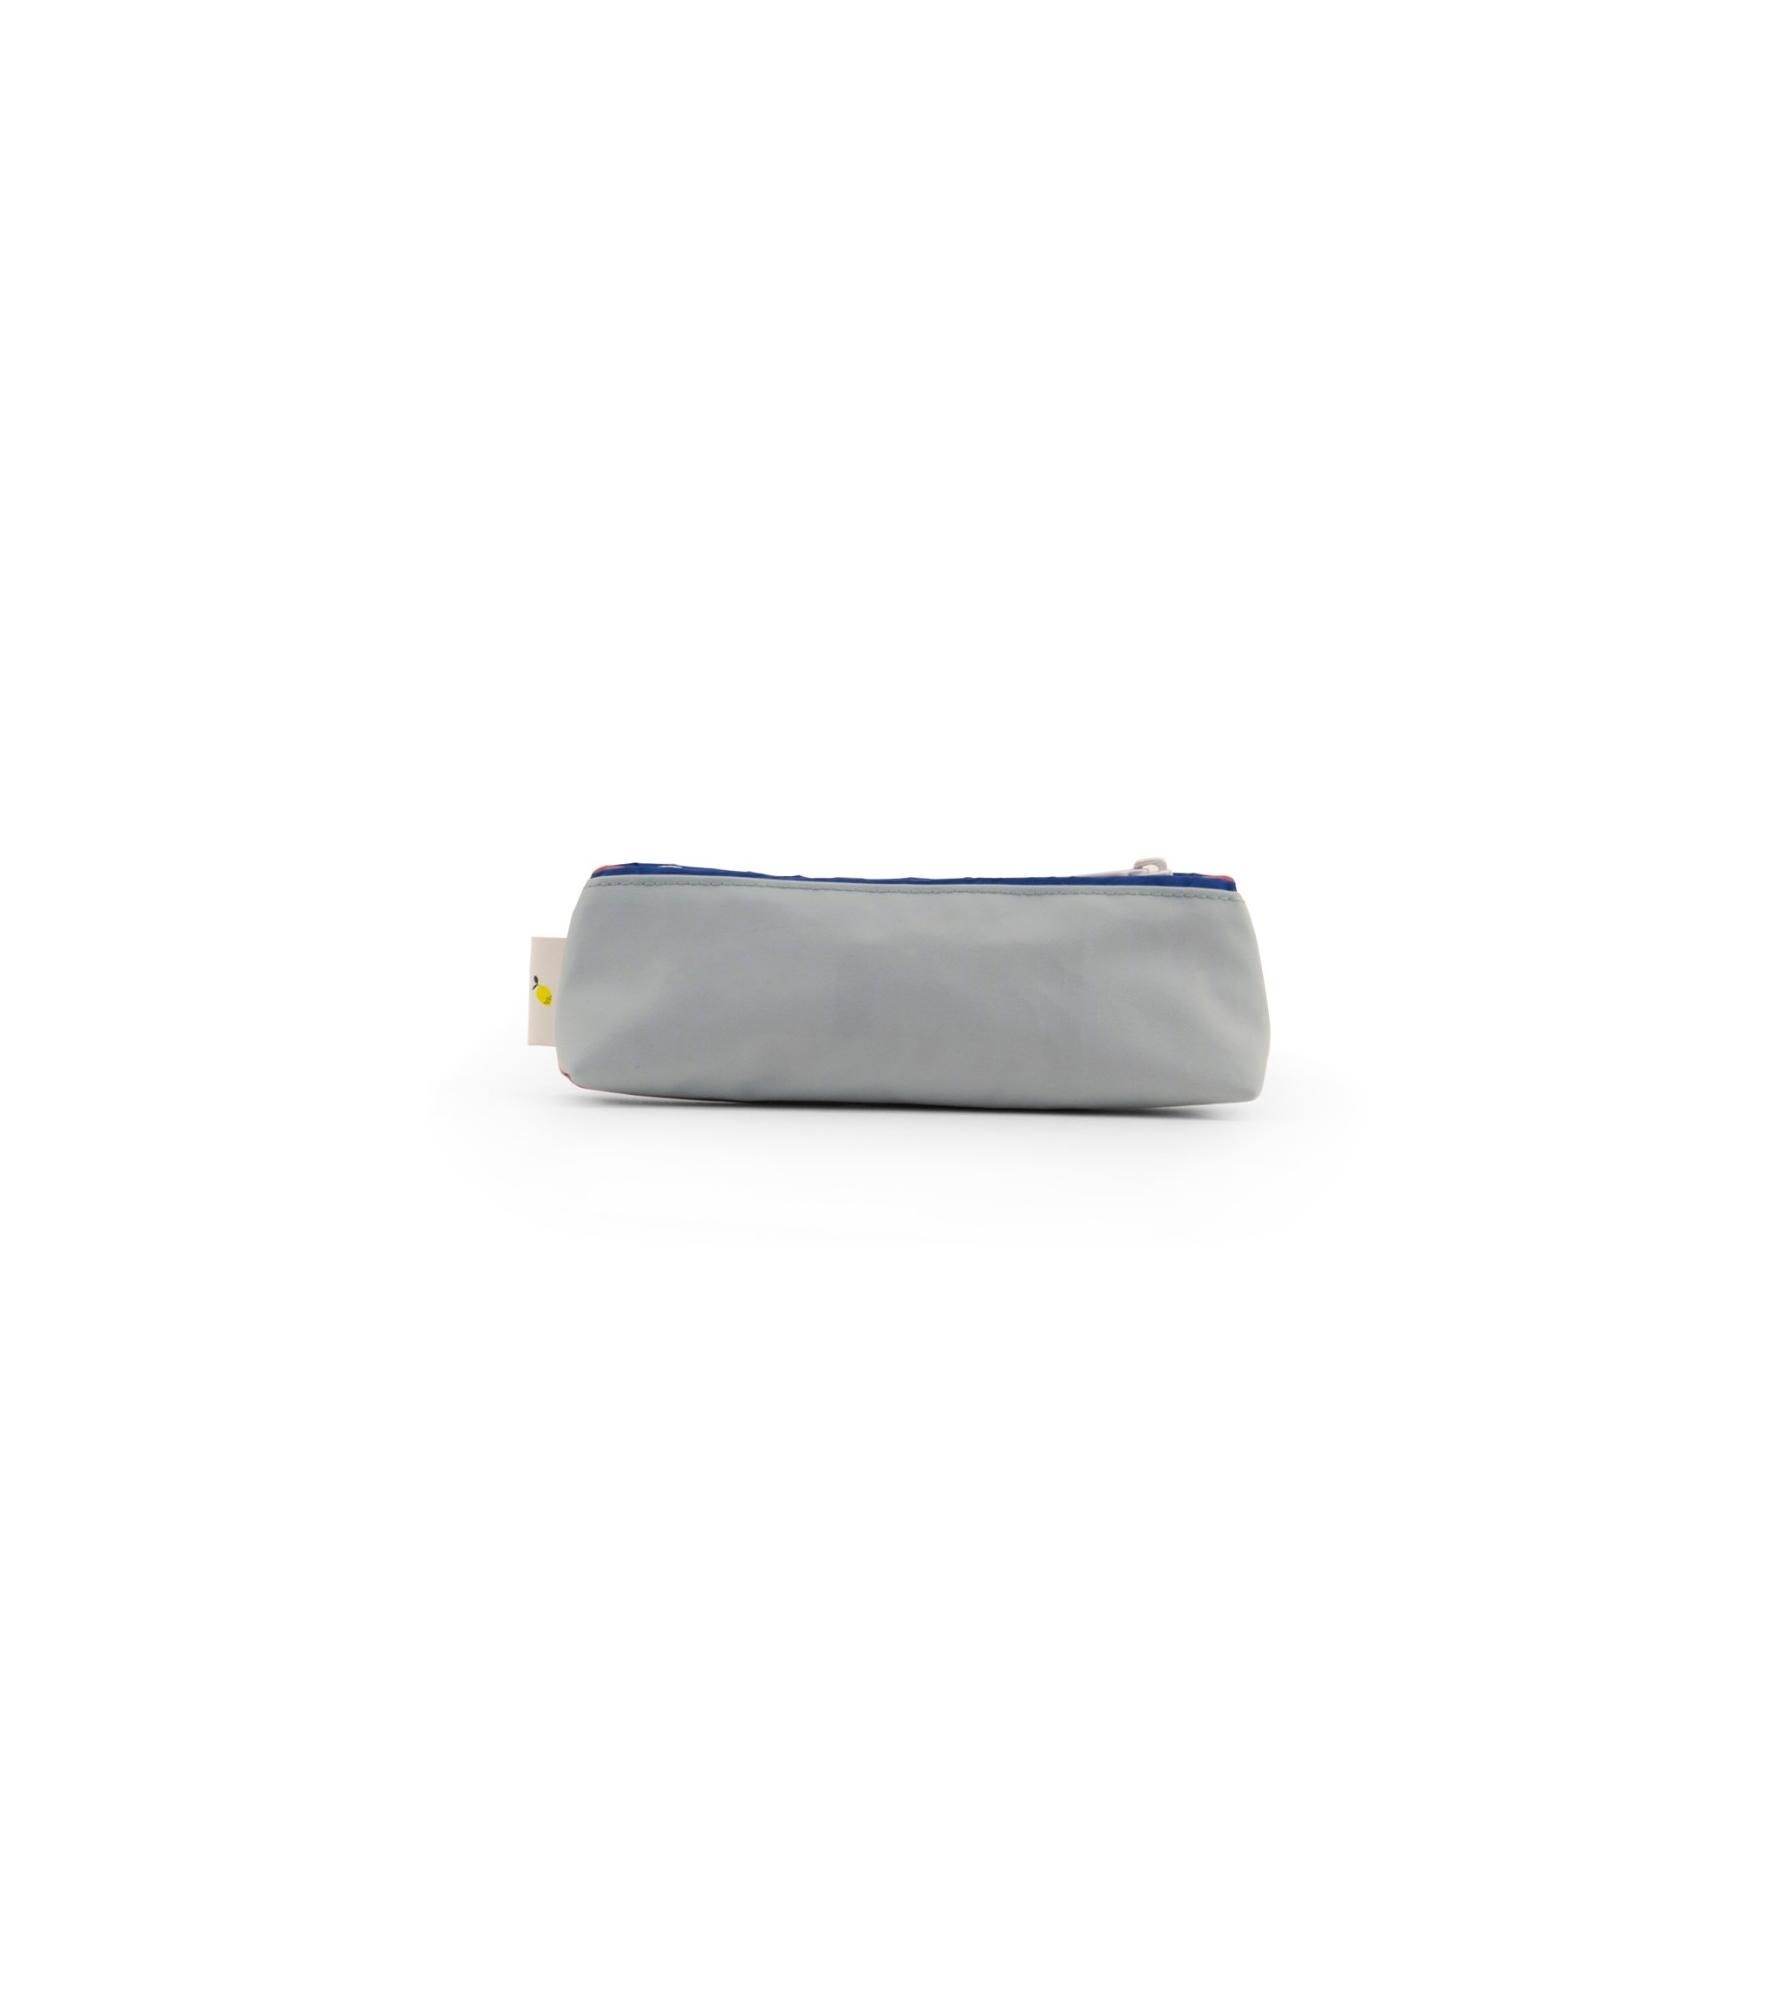 1801033 - Sticky Lemon - product - pencil case (3)_edit.jpg